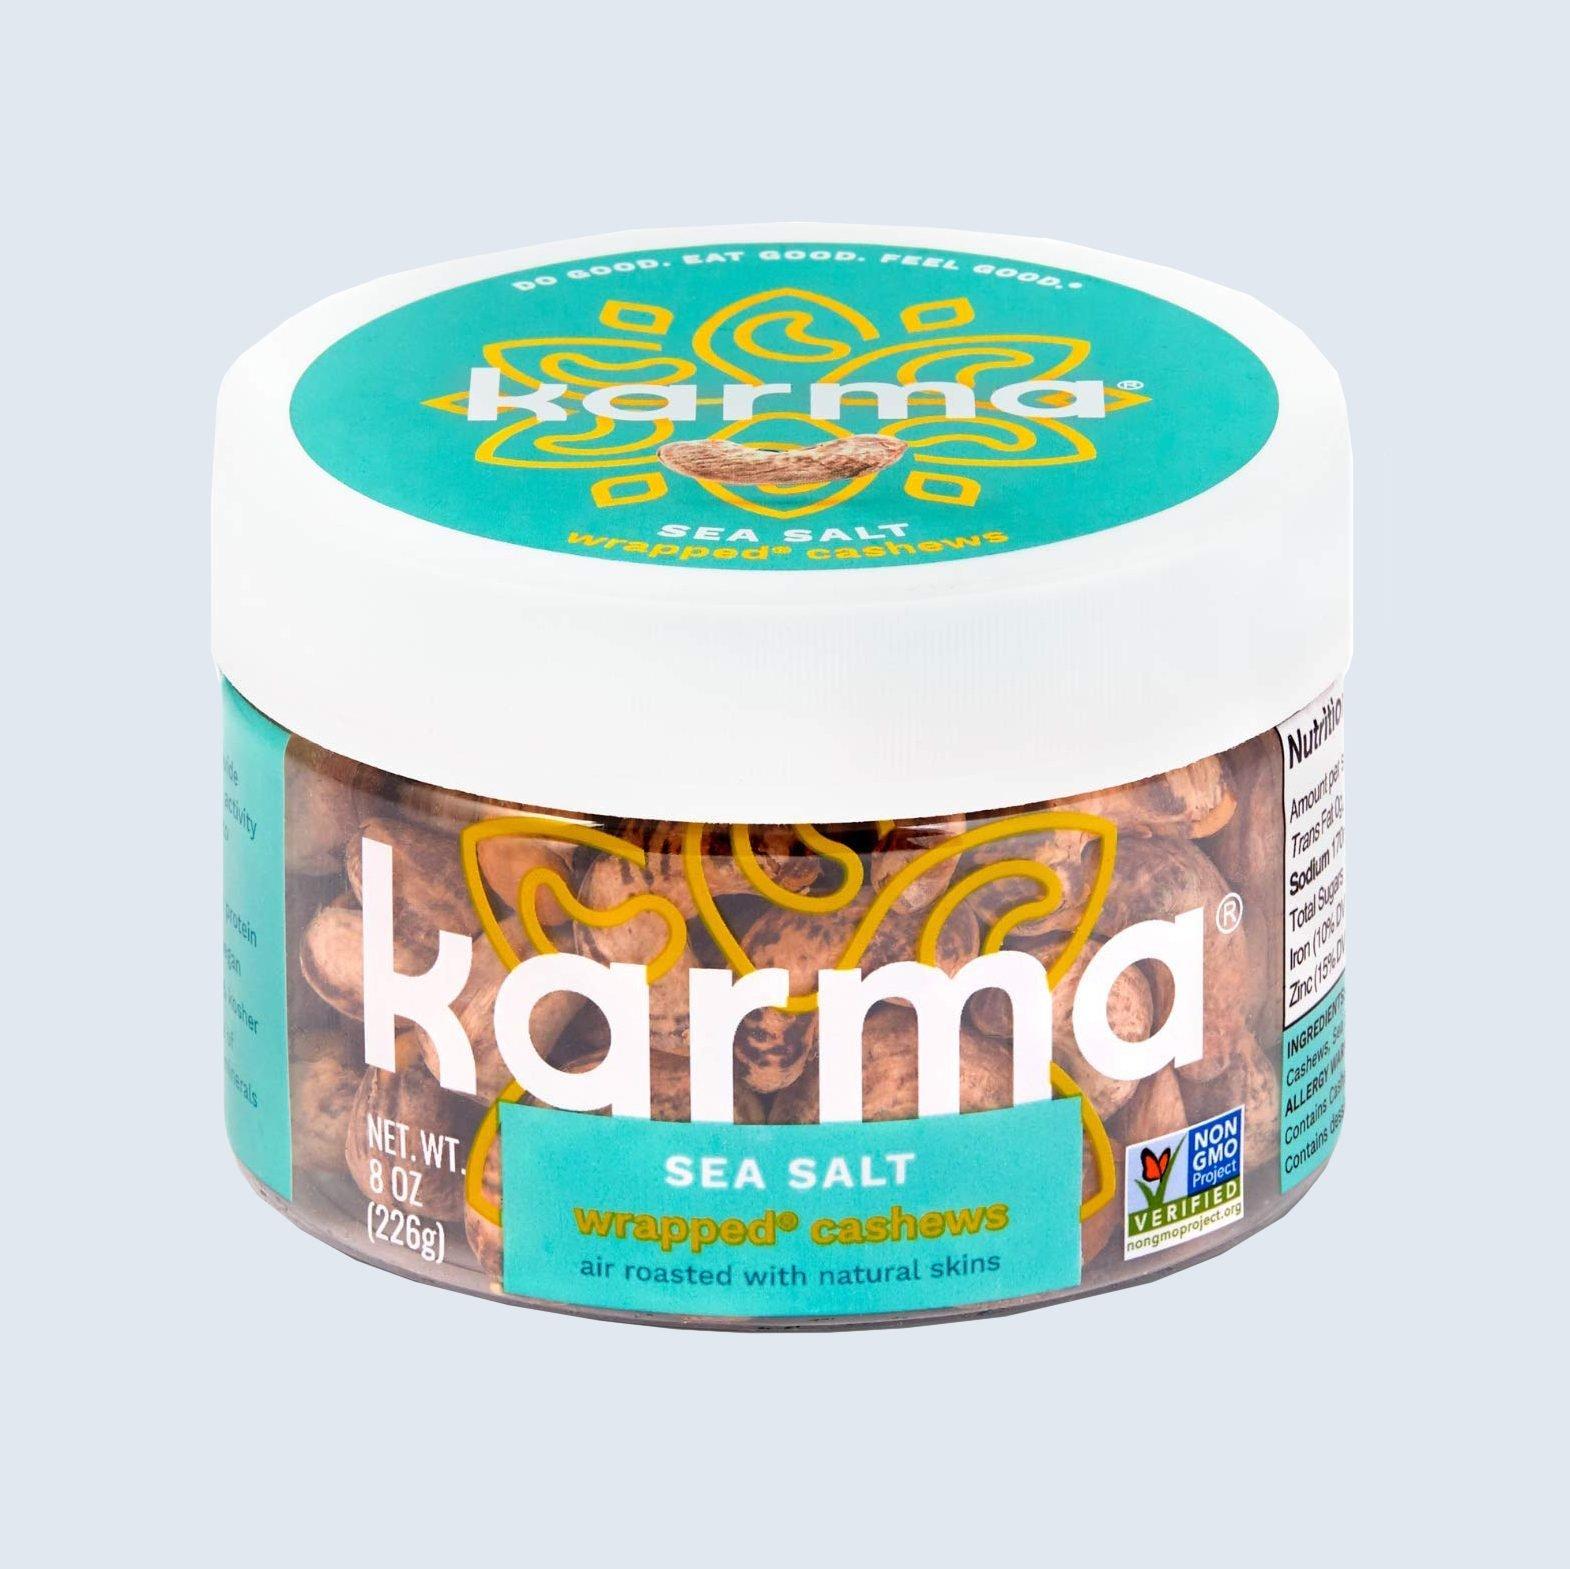 Karma Wrapped Cashews